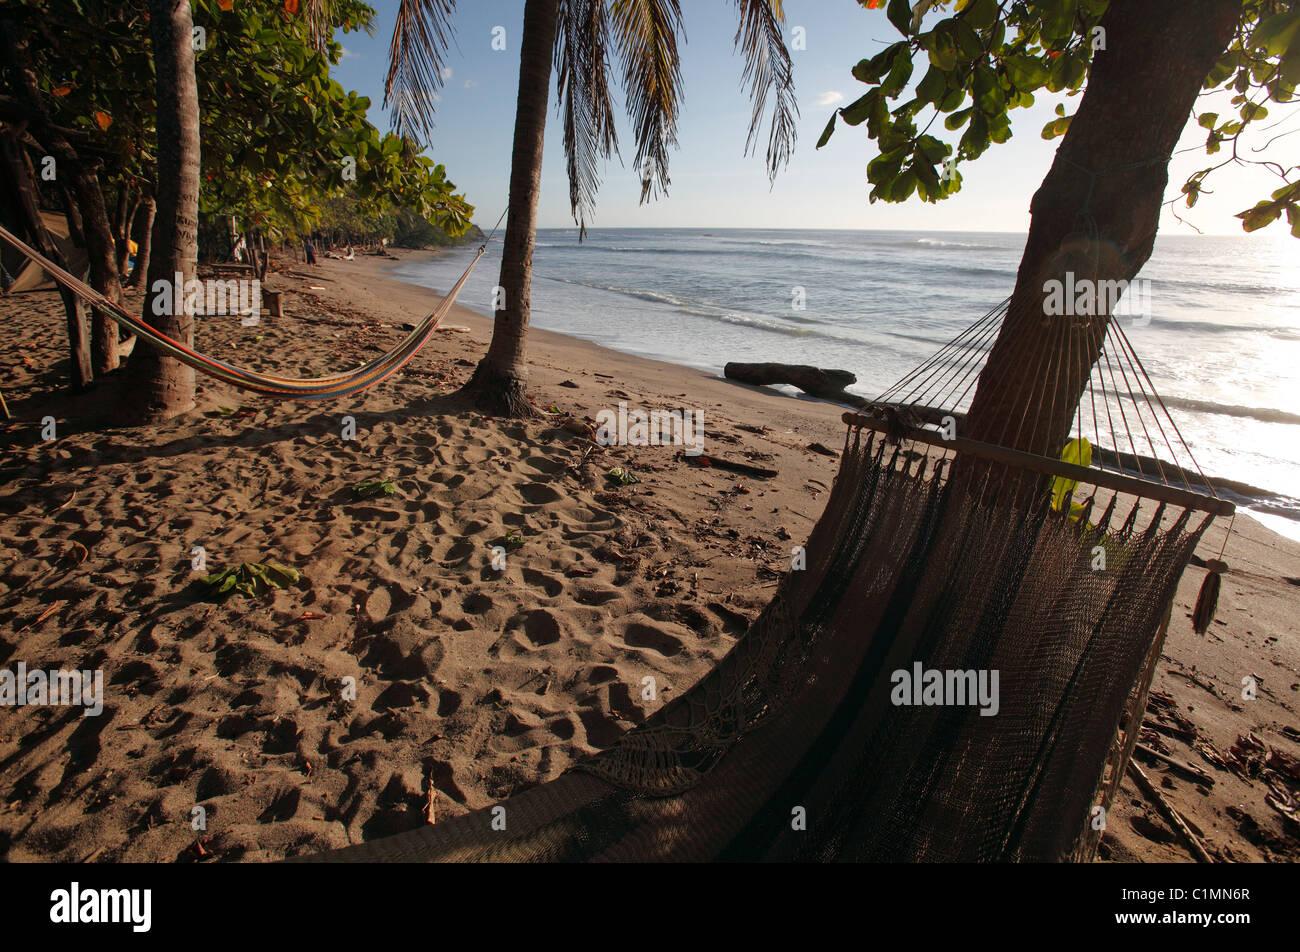 Hammocks under the palm trees, Playa Avellanas, Nicoya Peninsula, Costa Rica - Stock Image